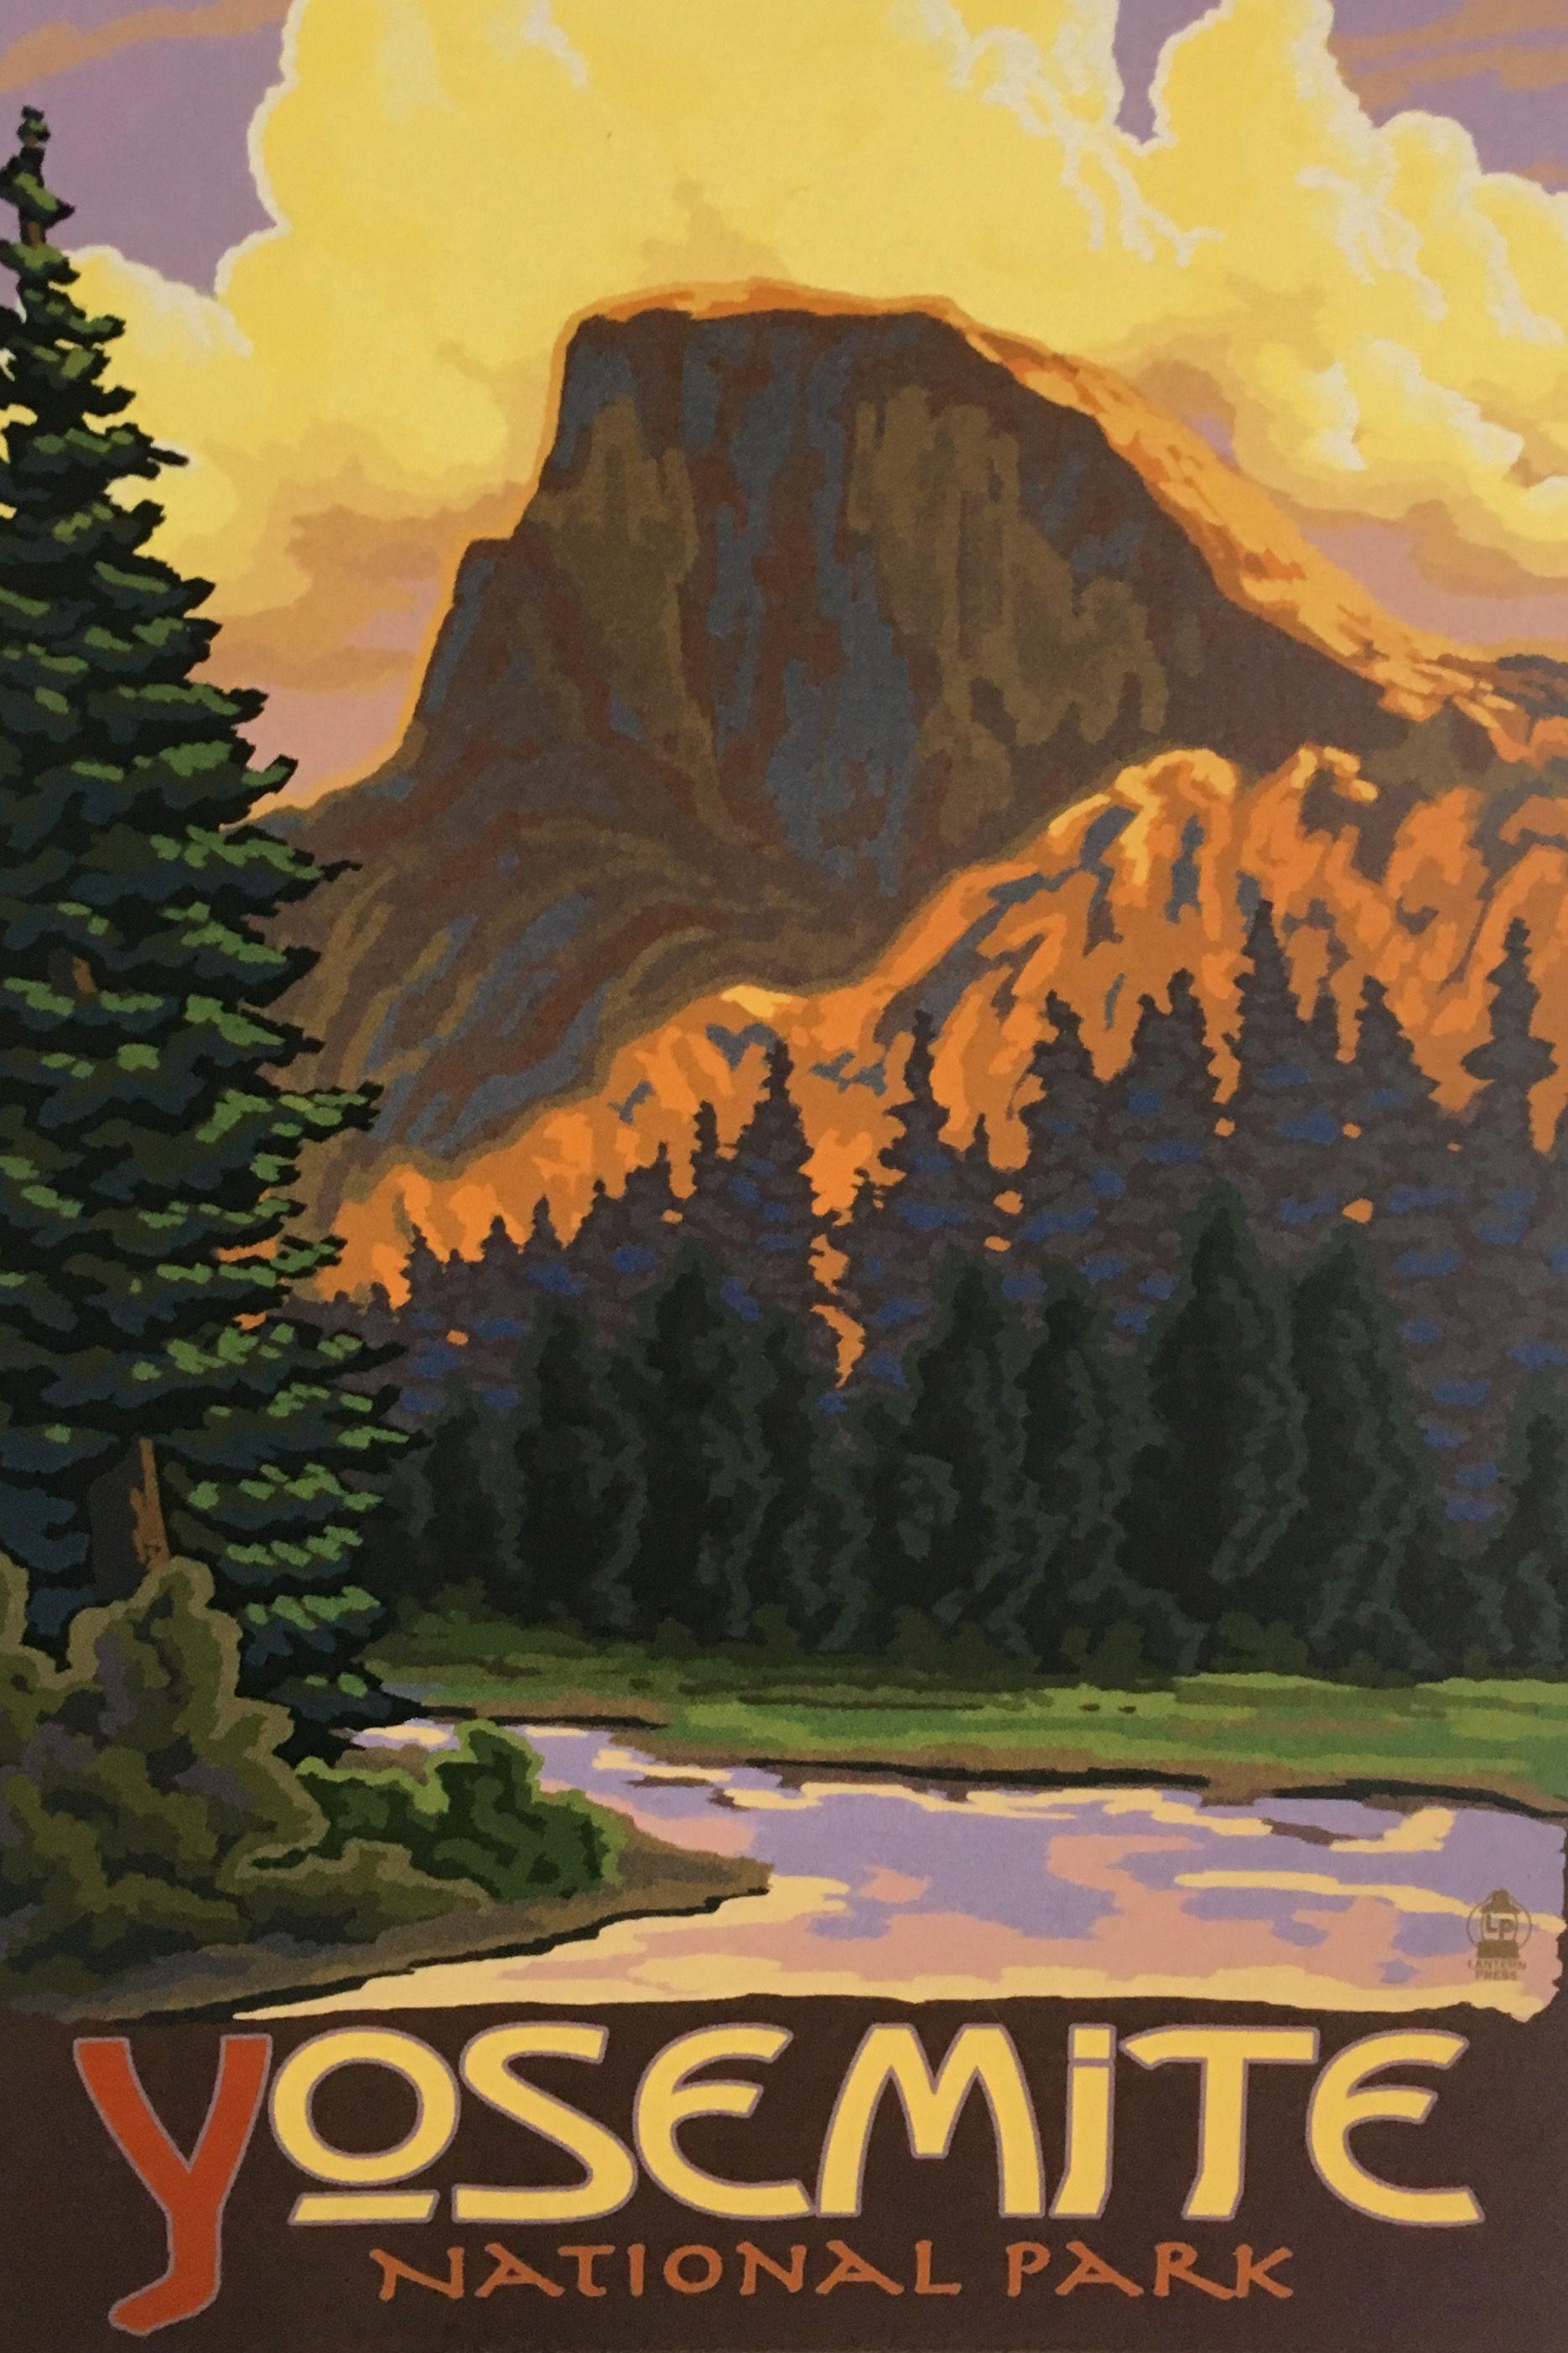 Yosemite National Park California Yosemite National Park